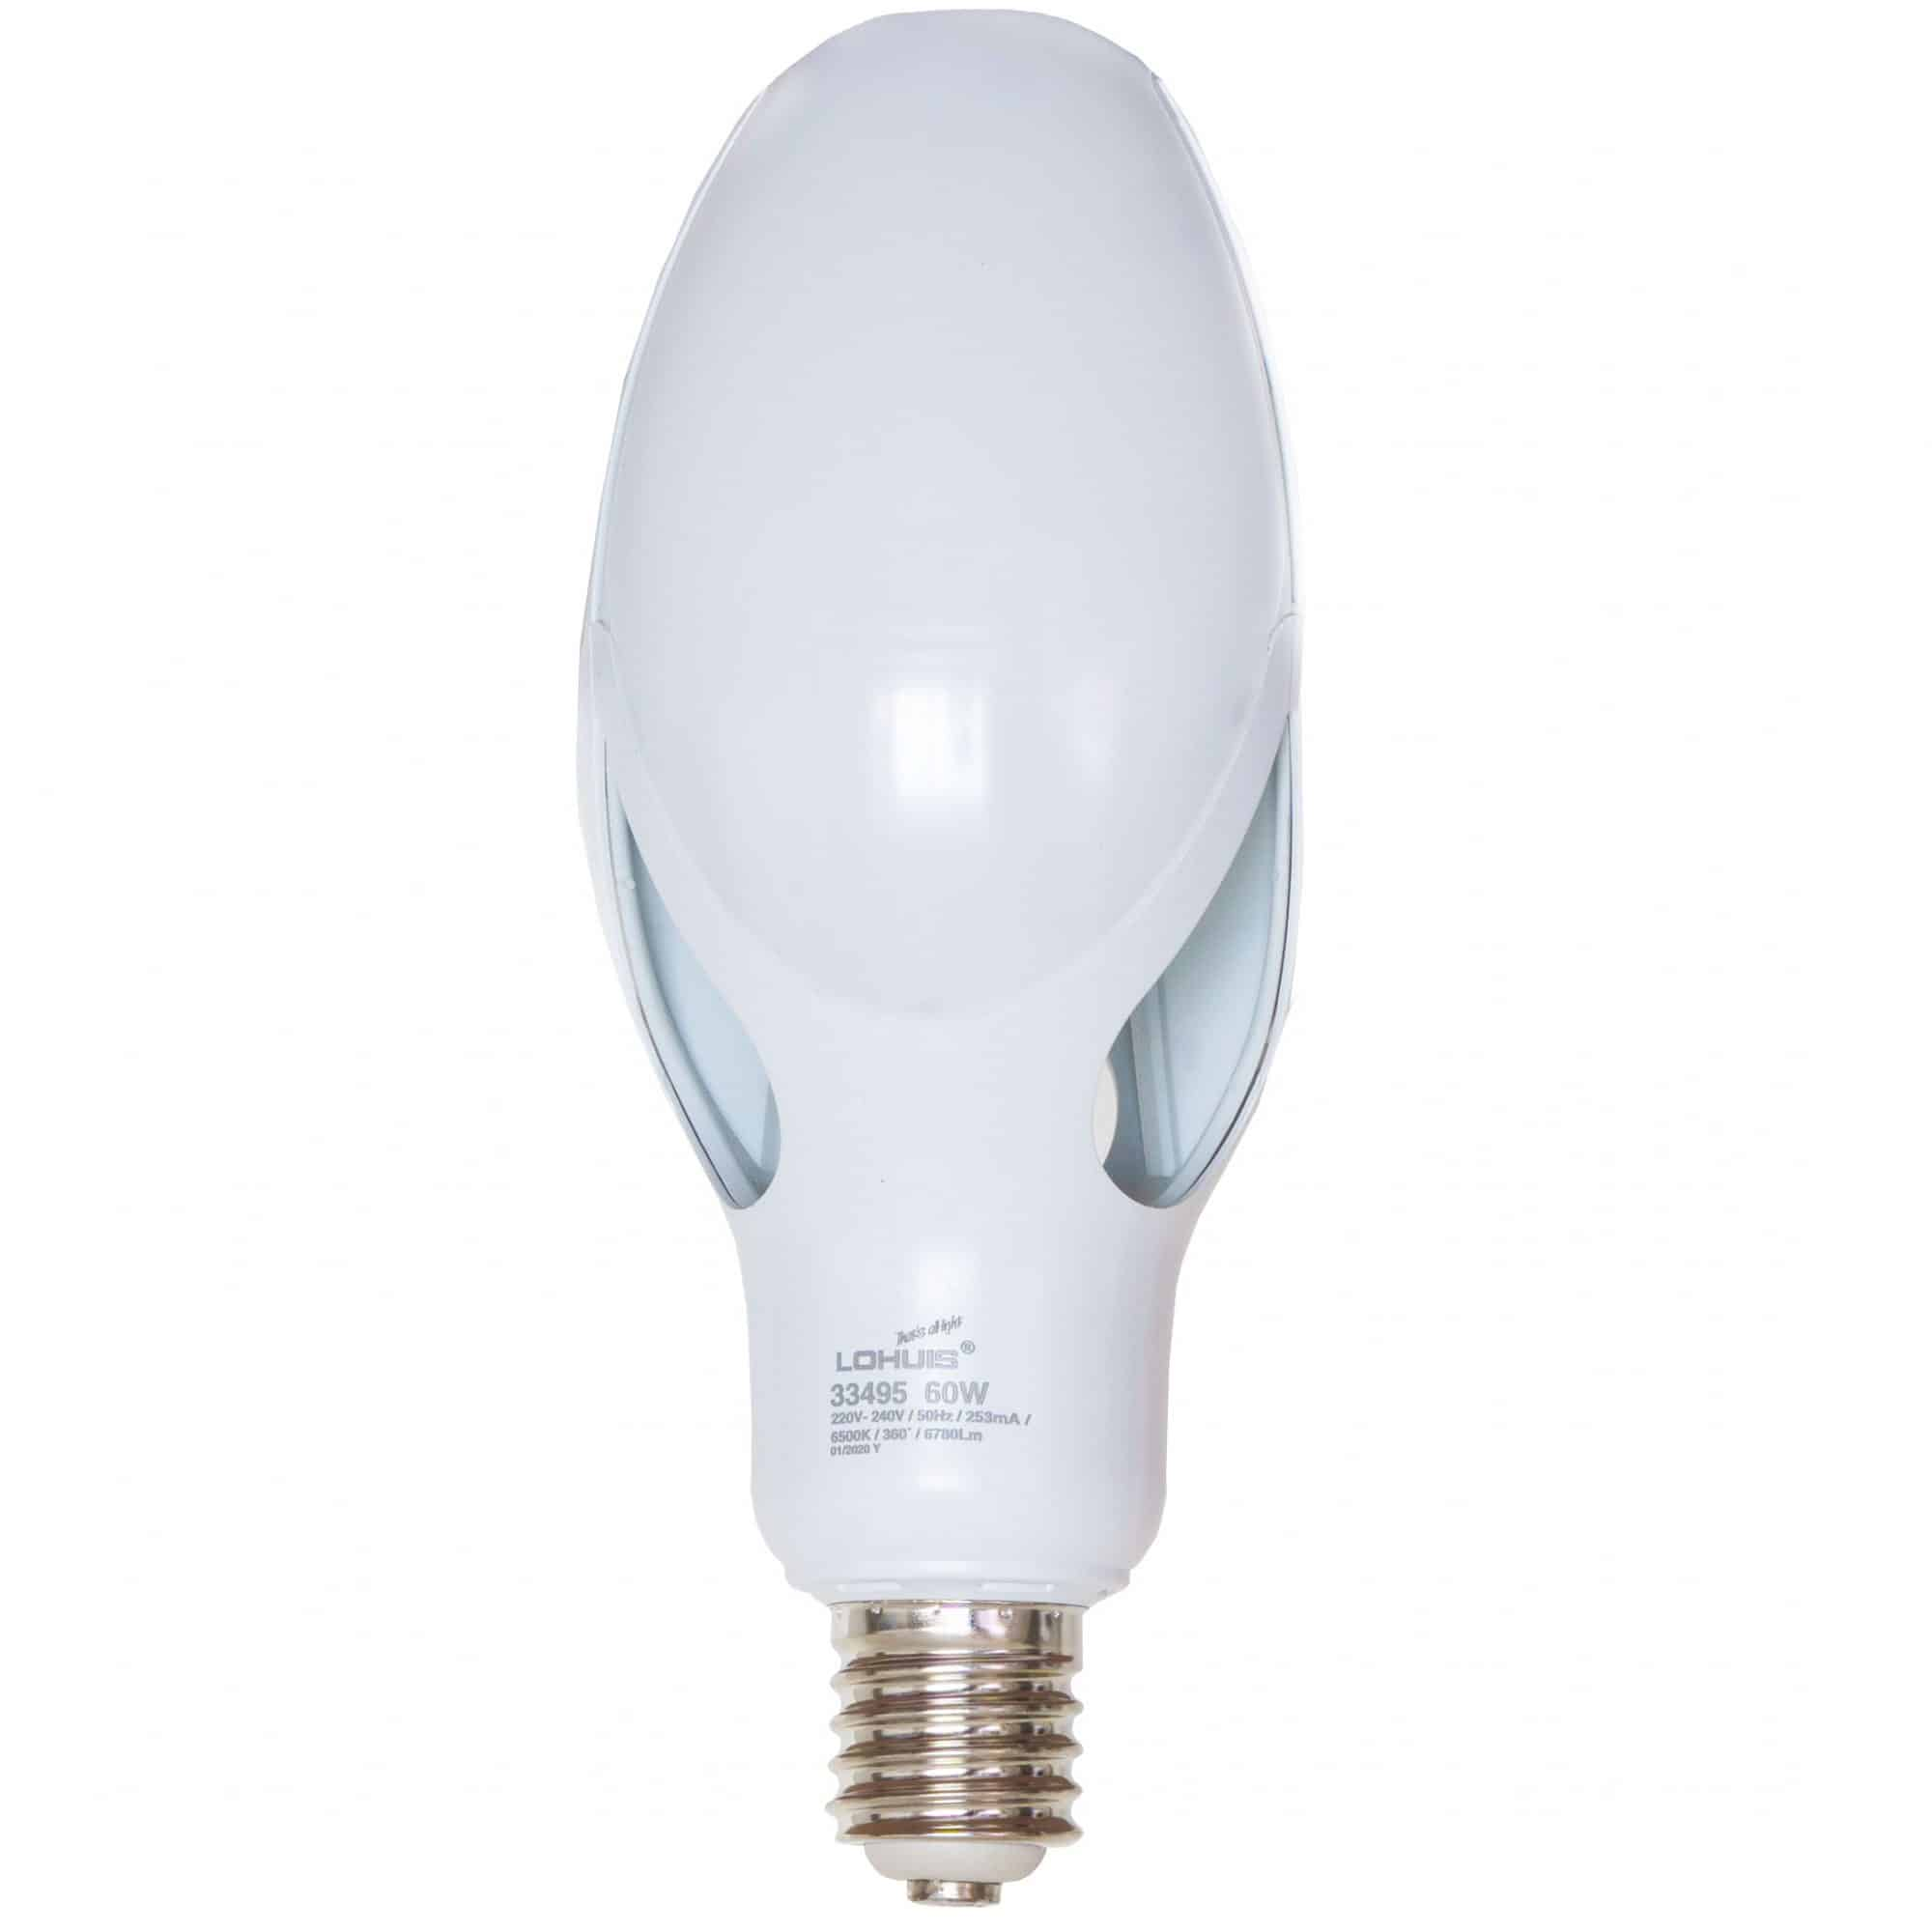 BEC LED FLOWER E40 60W 6500K  LOHUIS mathaus 2021